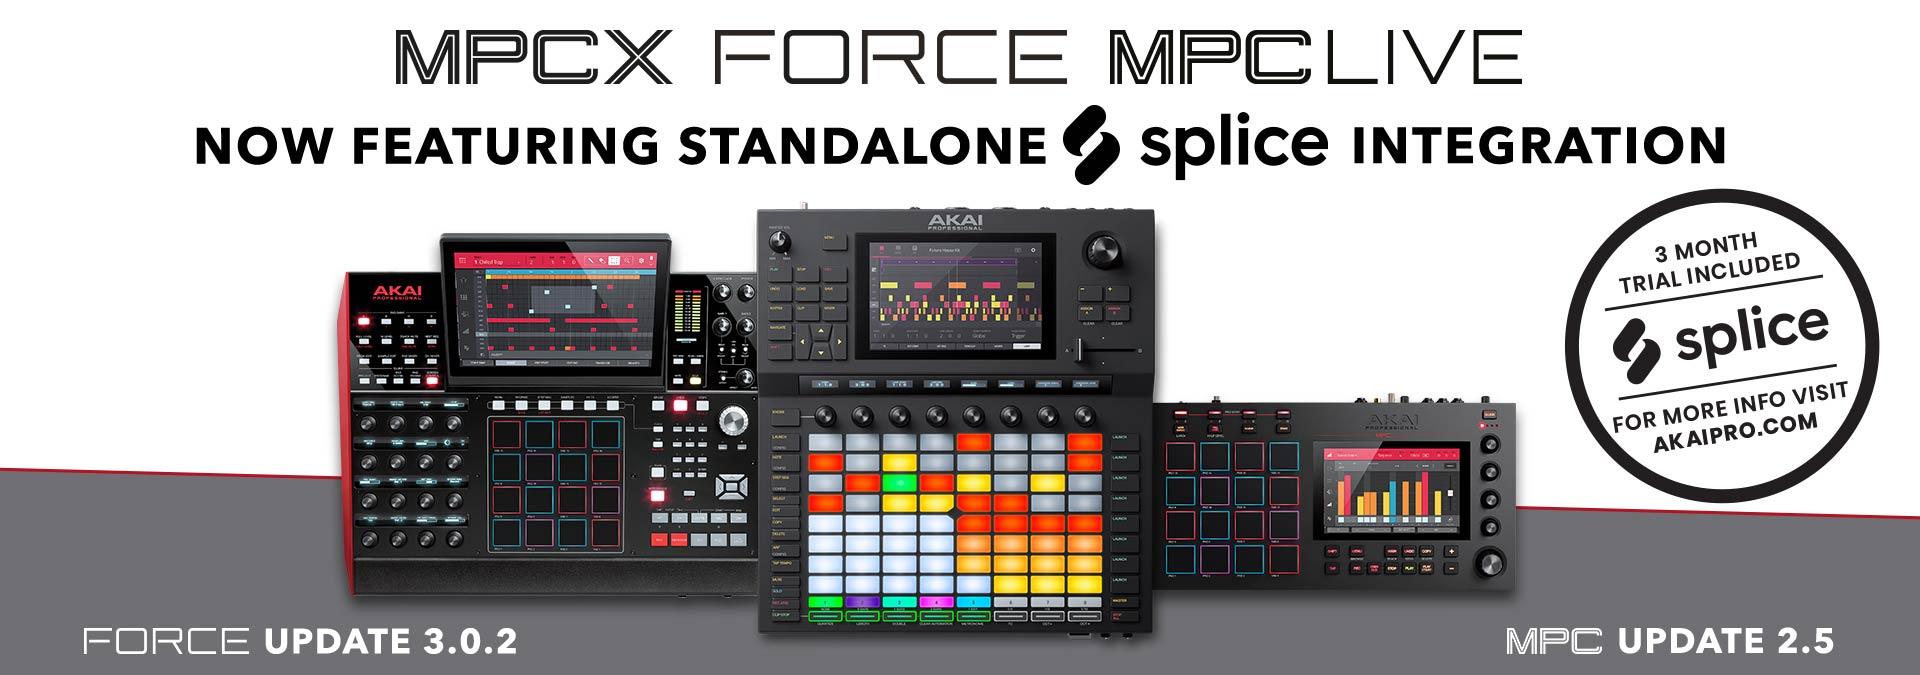 AKAI PROFESSIONAL Announces Splice Integration In Force, MPC